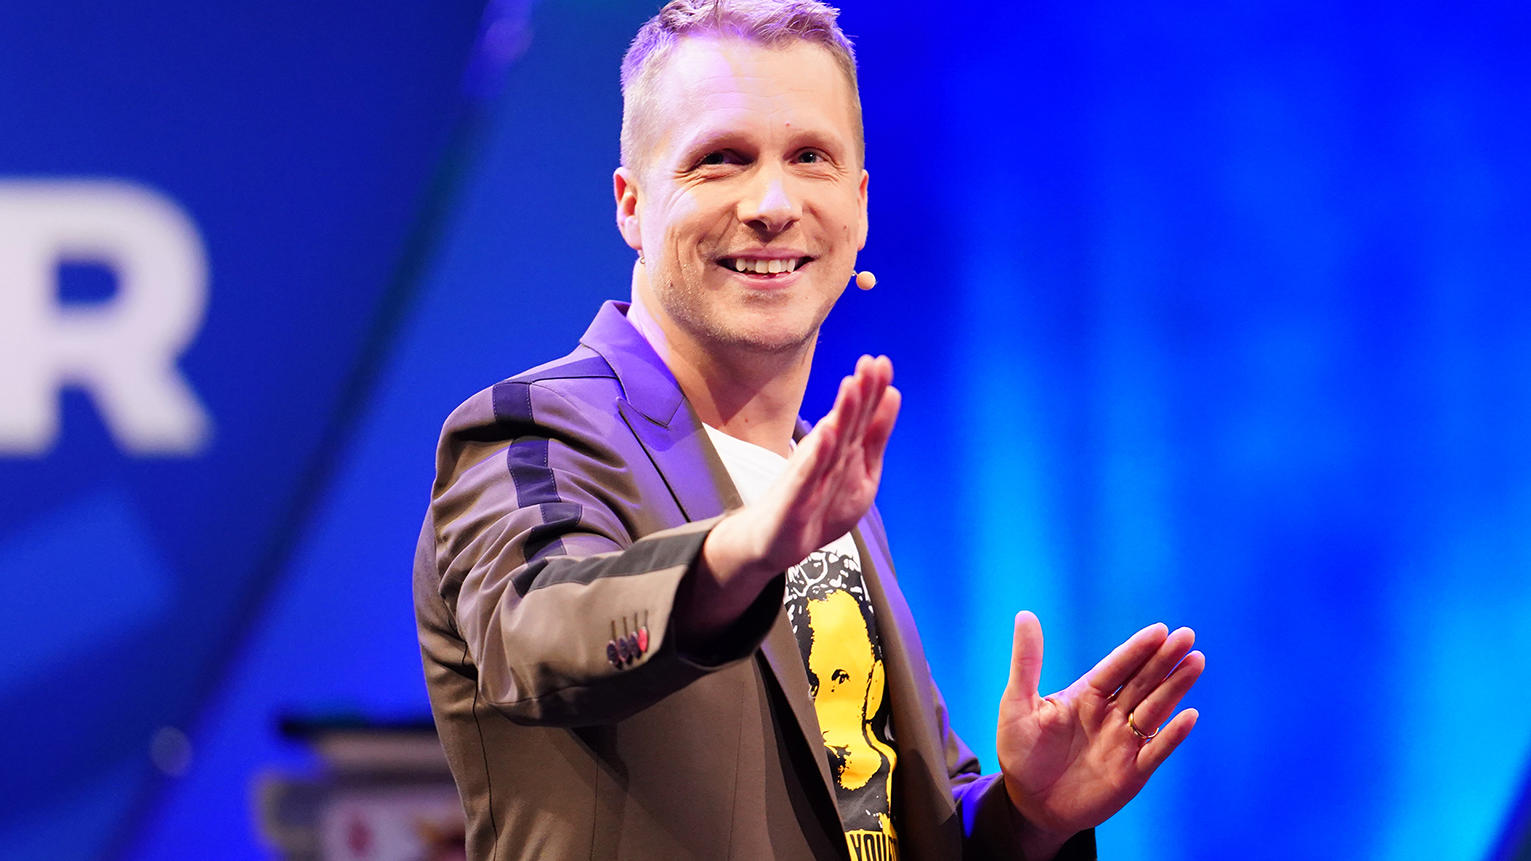 Oliver Pocher Bekommt Neue Late Night Show Bei Rtl